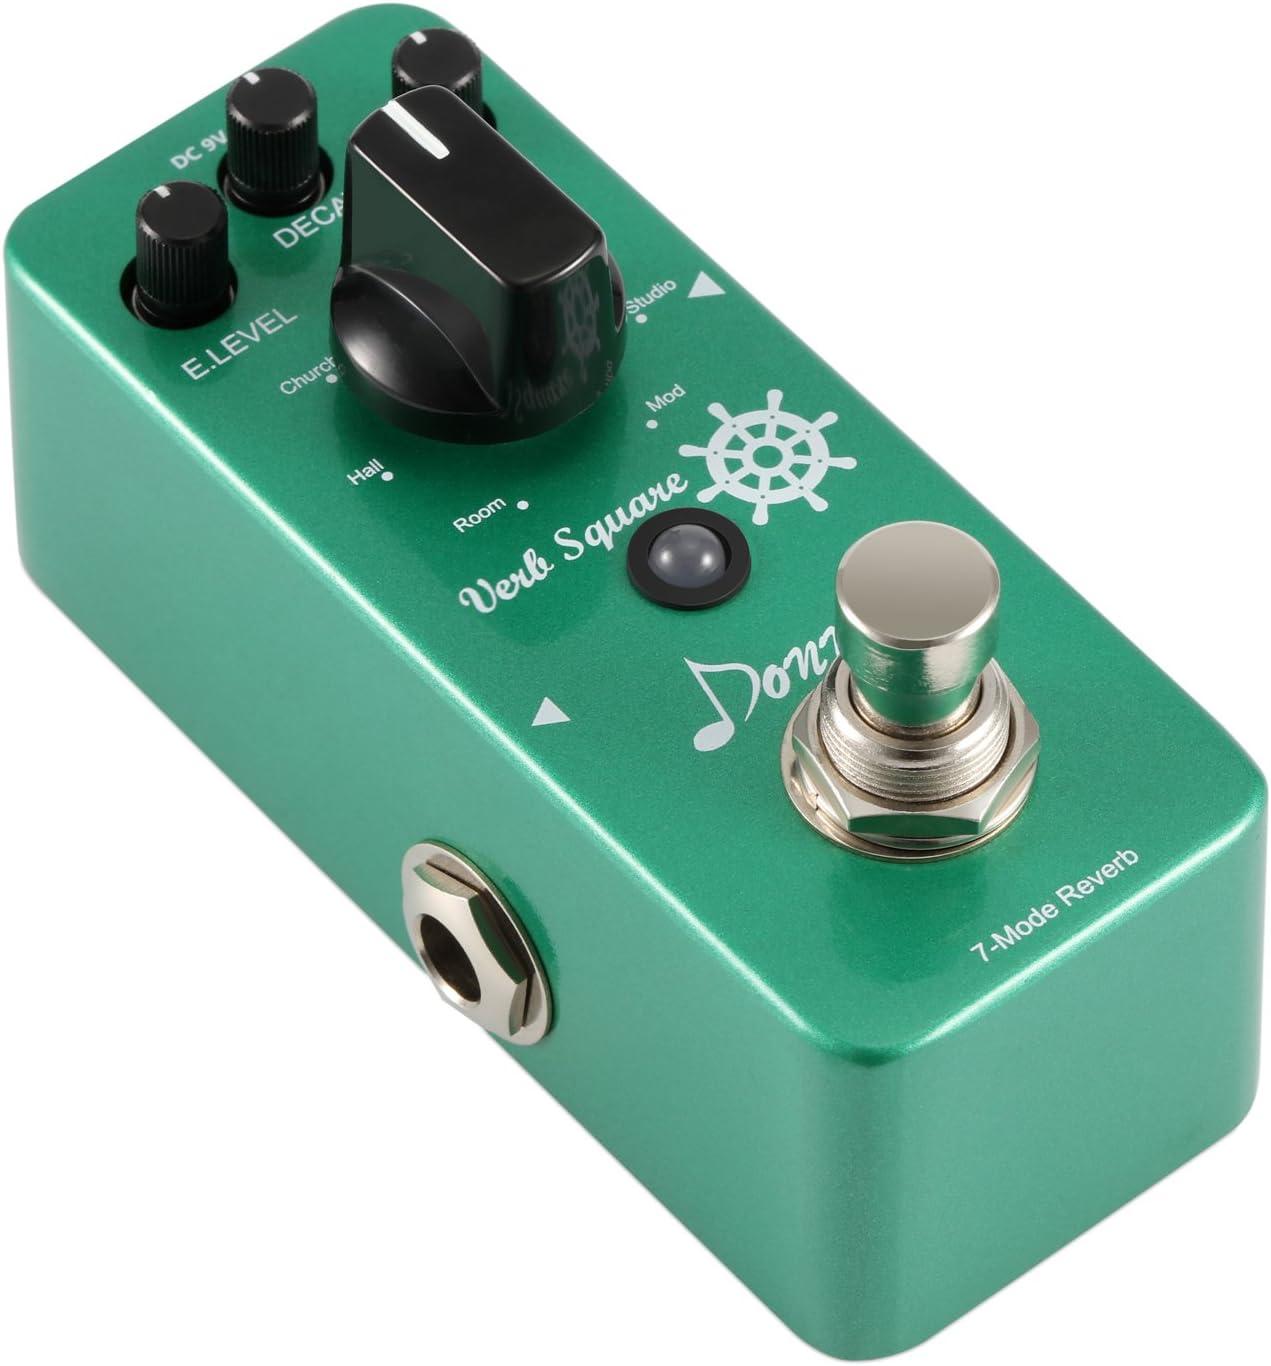 Donner Verb Square 7- Pedal Efecto de Reverberación de Guitarra Con 7 Modos